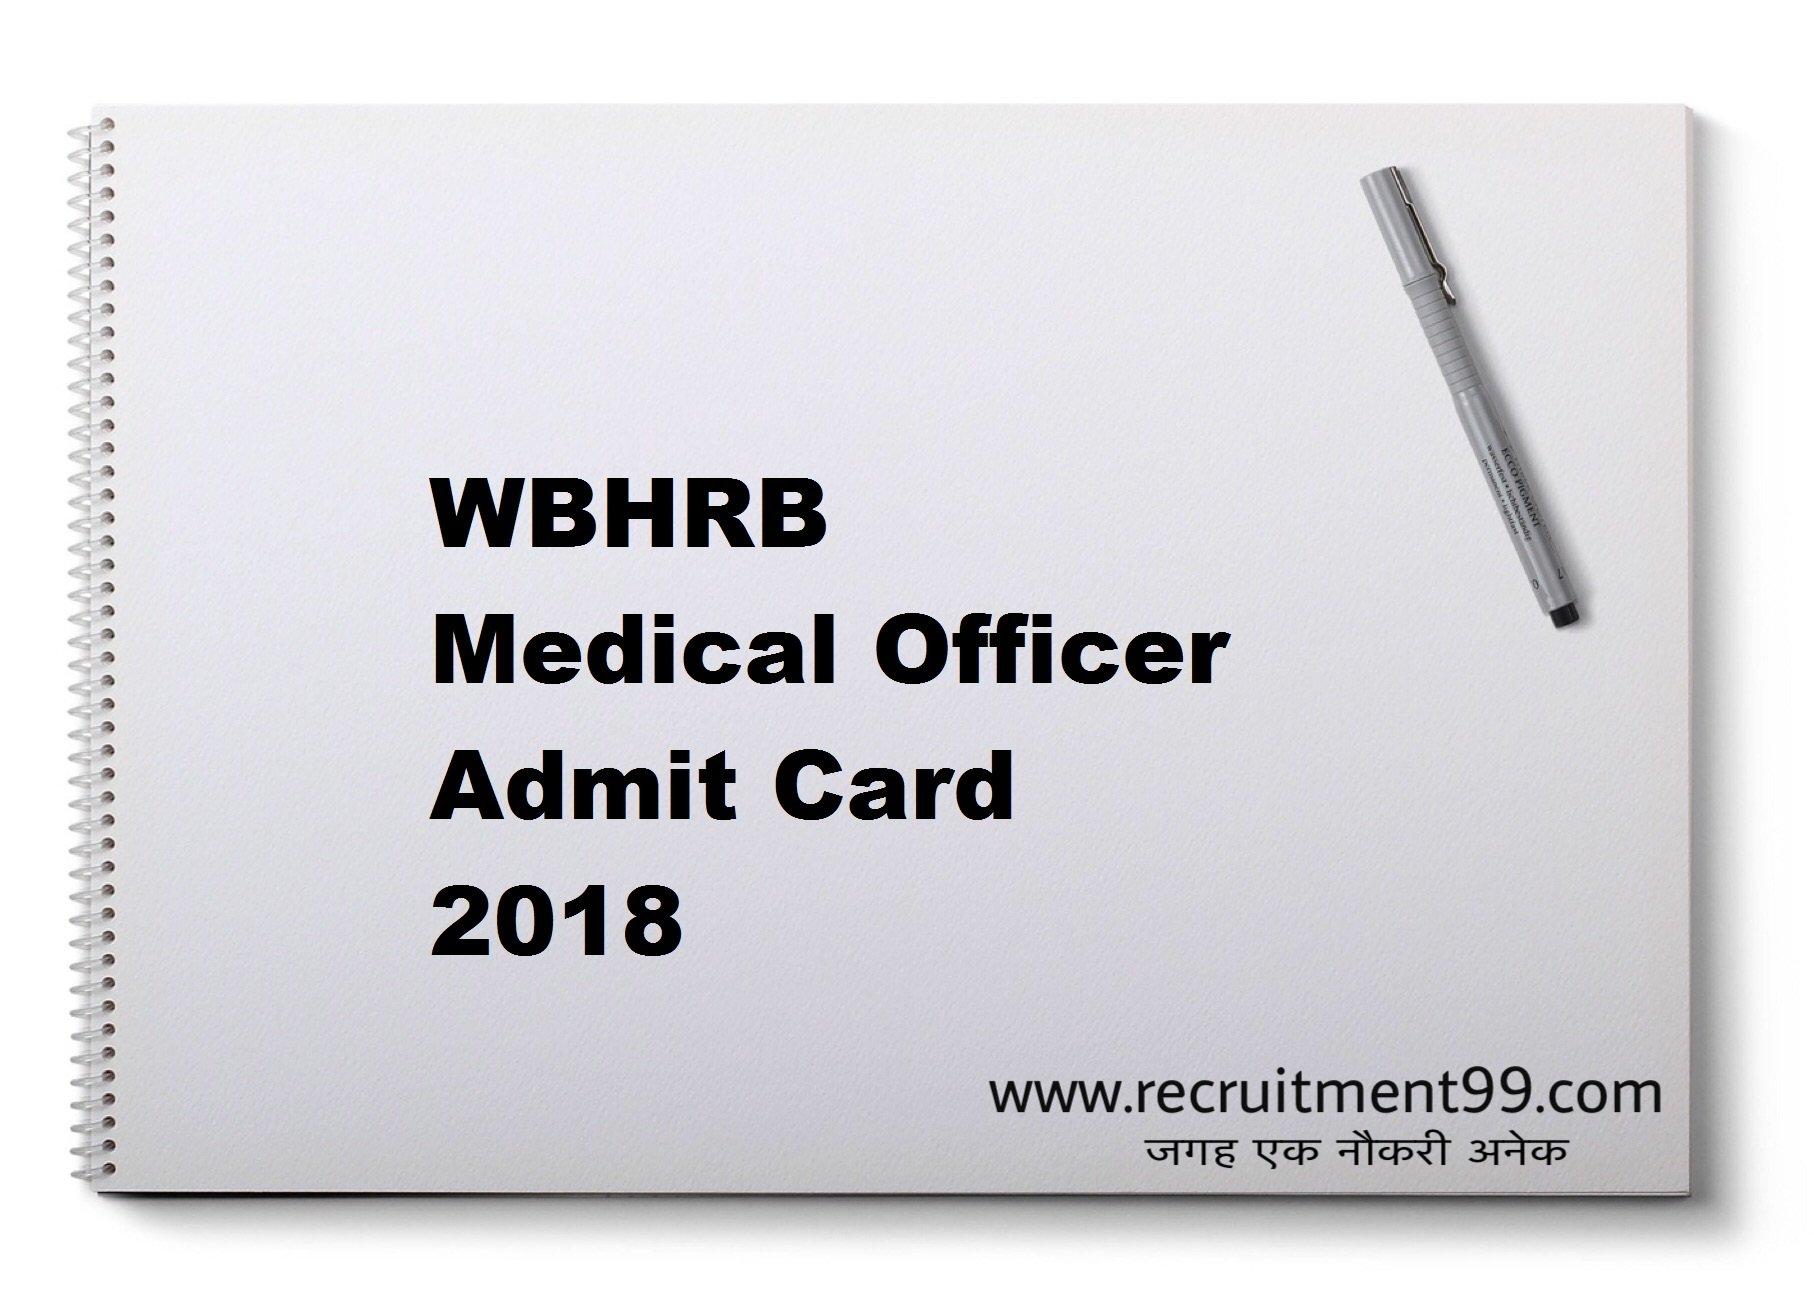 WBHRB Medical Officer Admit Card 2018